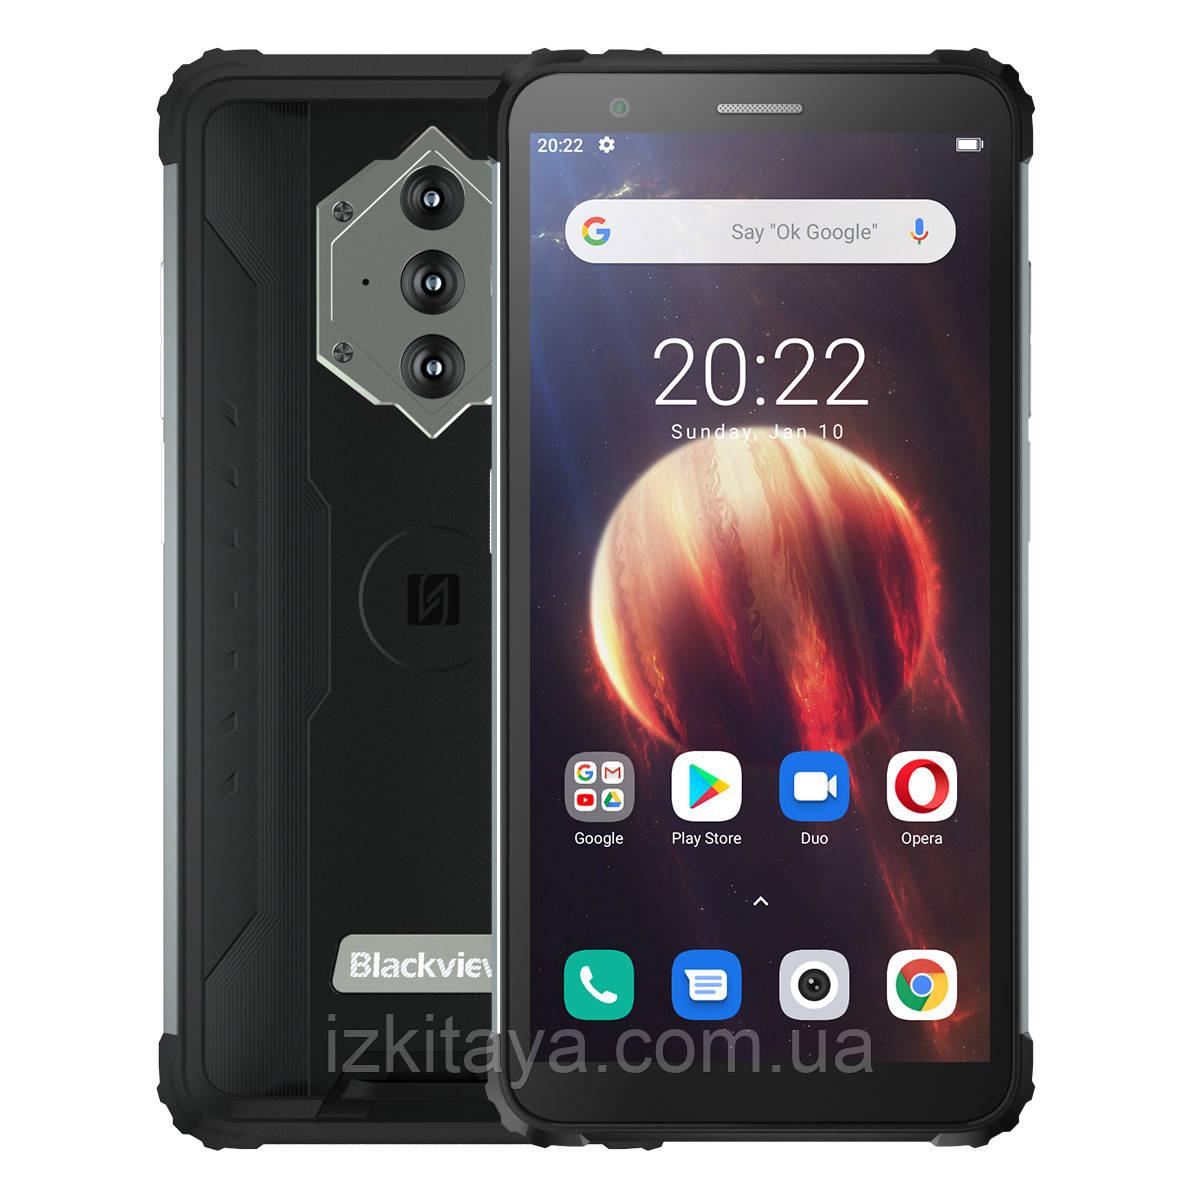 Смартфон Blackview BV6600 black мощный аккумулятор 8580 mAh + Свит ТВ 3 месяца бесплатно